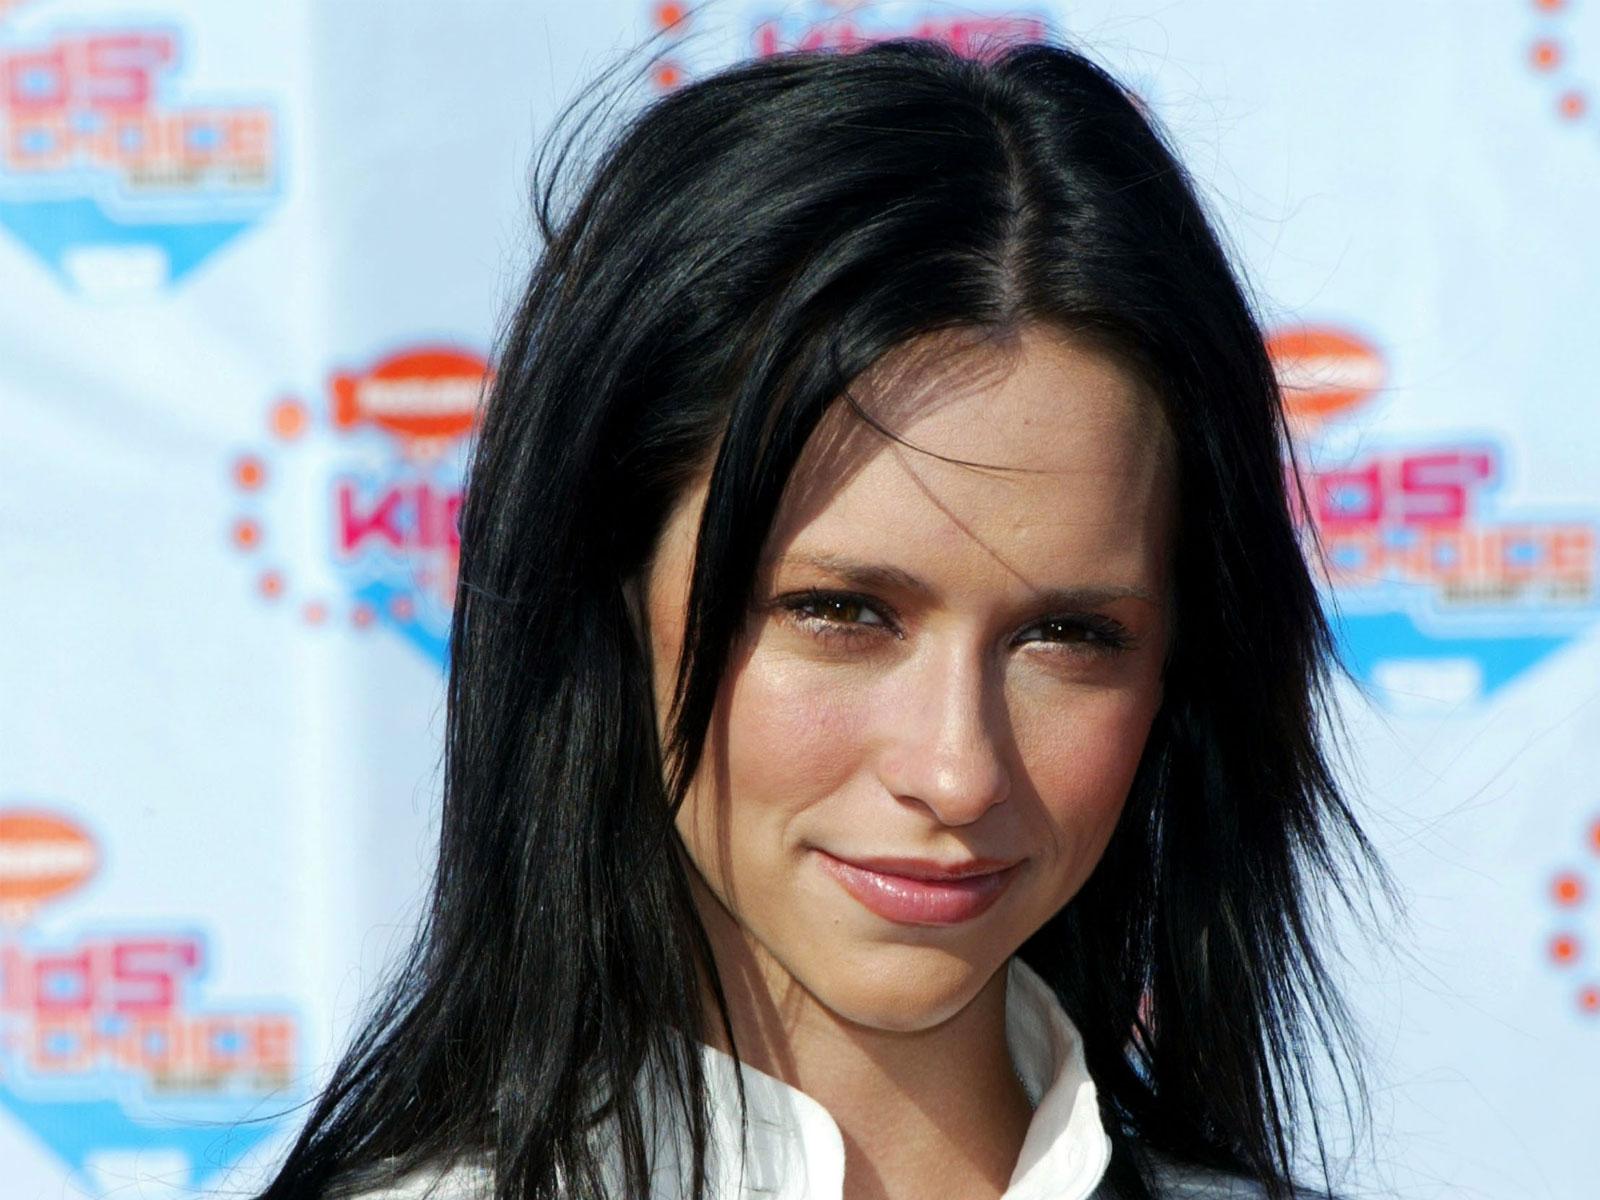 http://2.bp.blogspot.com/-8kCiA6OWtsk/UNtU2o7wZ_I/AAAAAAAACKI/tPpbqIxAQog/s1600/Jennifer-Love-Hewitt.jpg